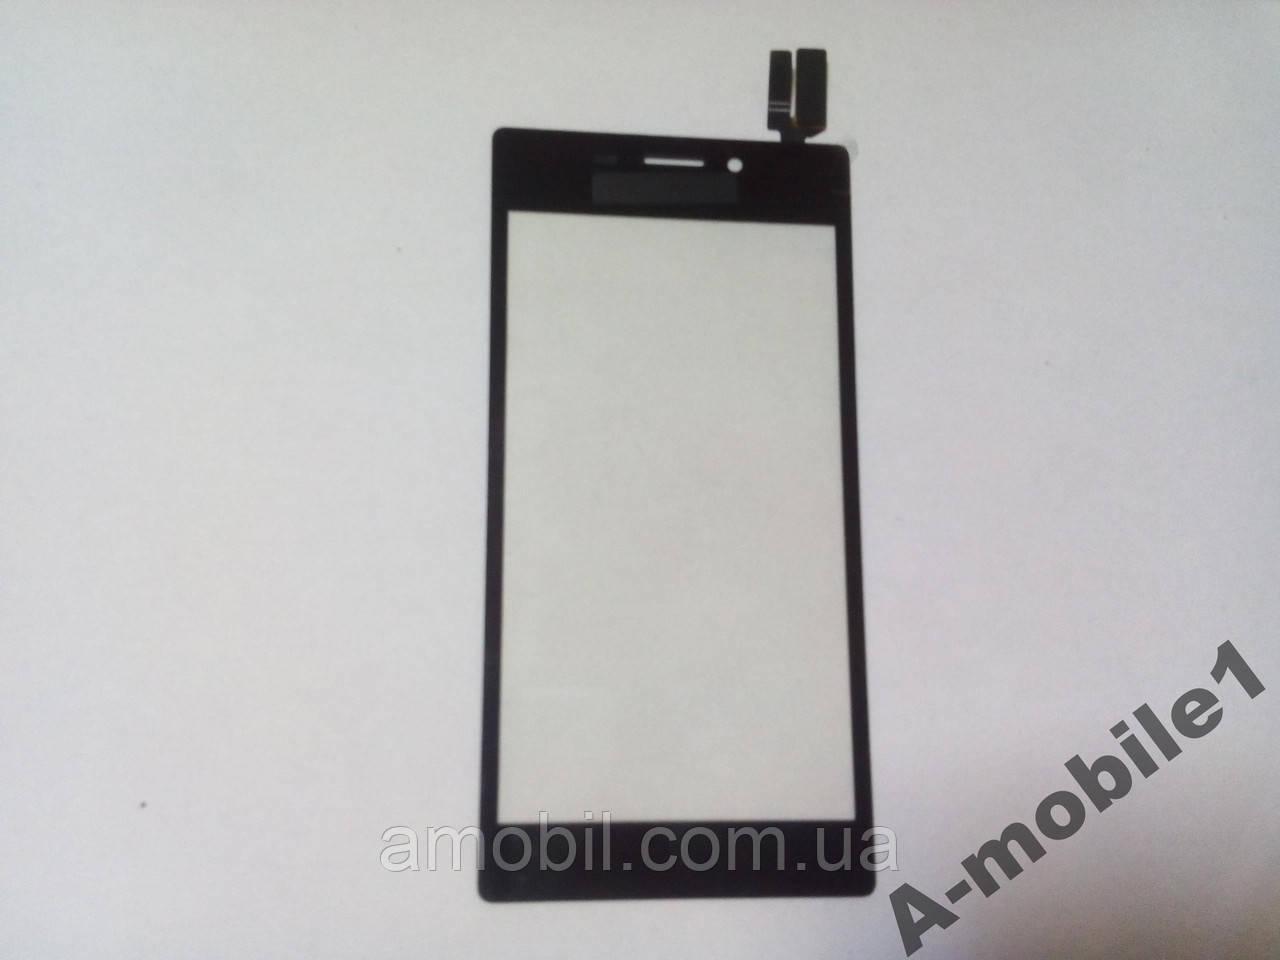 Сенсор Sony D2302 / D2303 / D2305 Xperia M2 orig